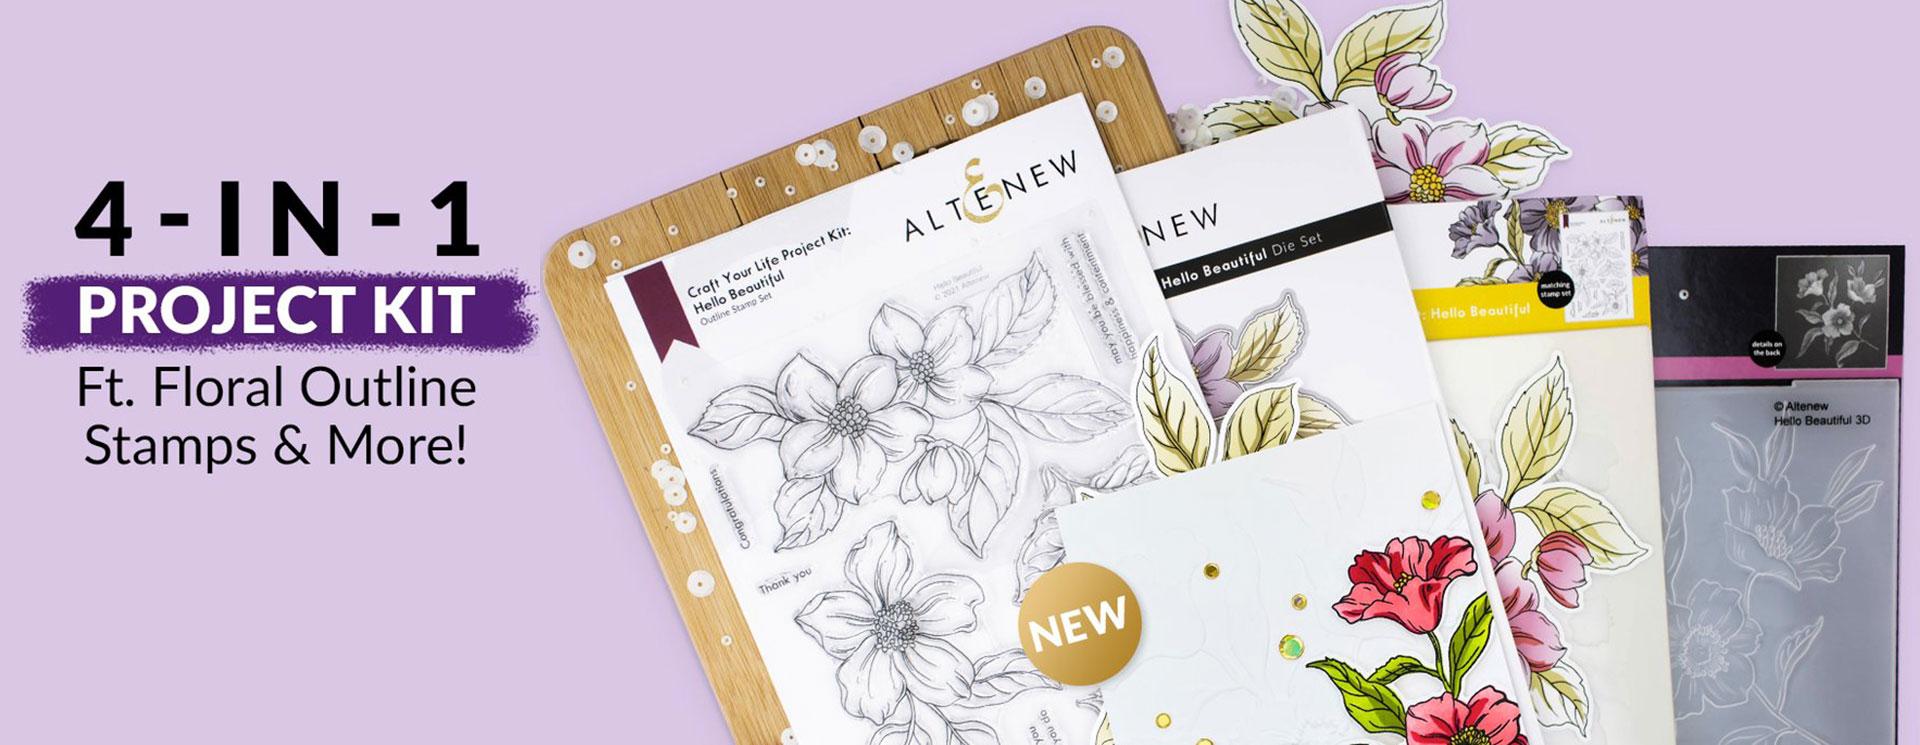 Altenew Crafting Kit